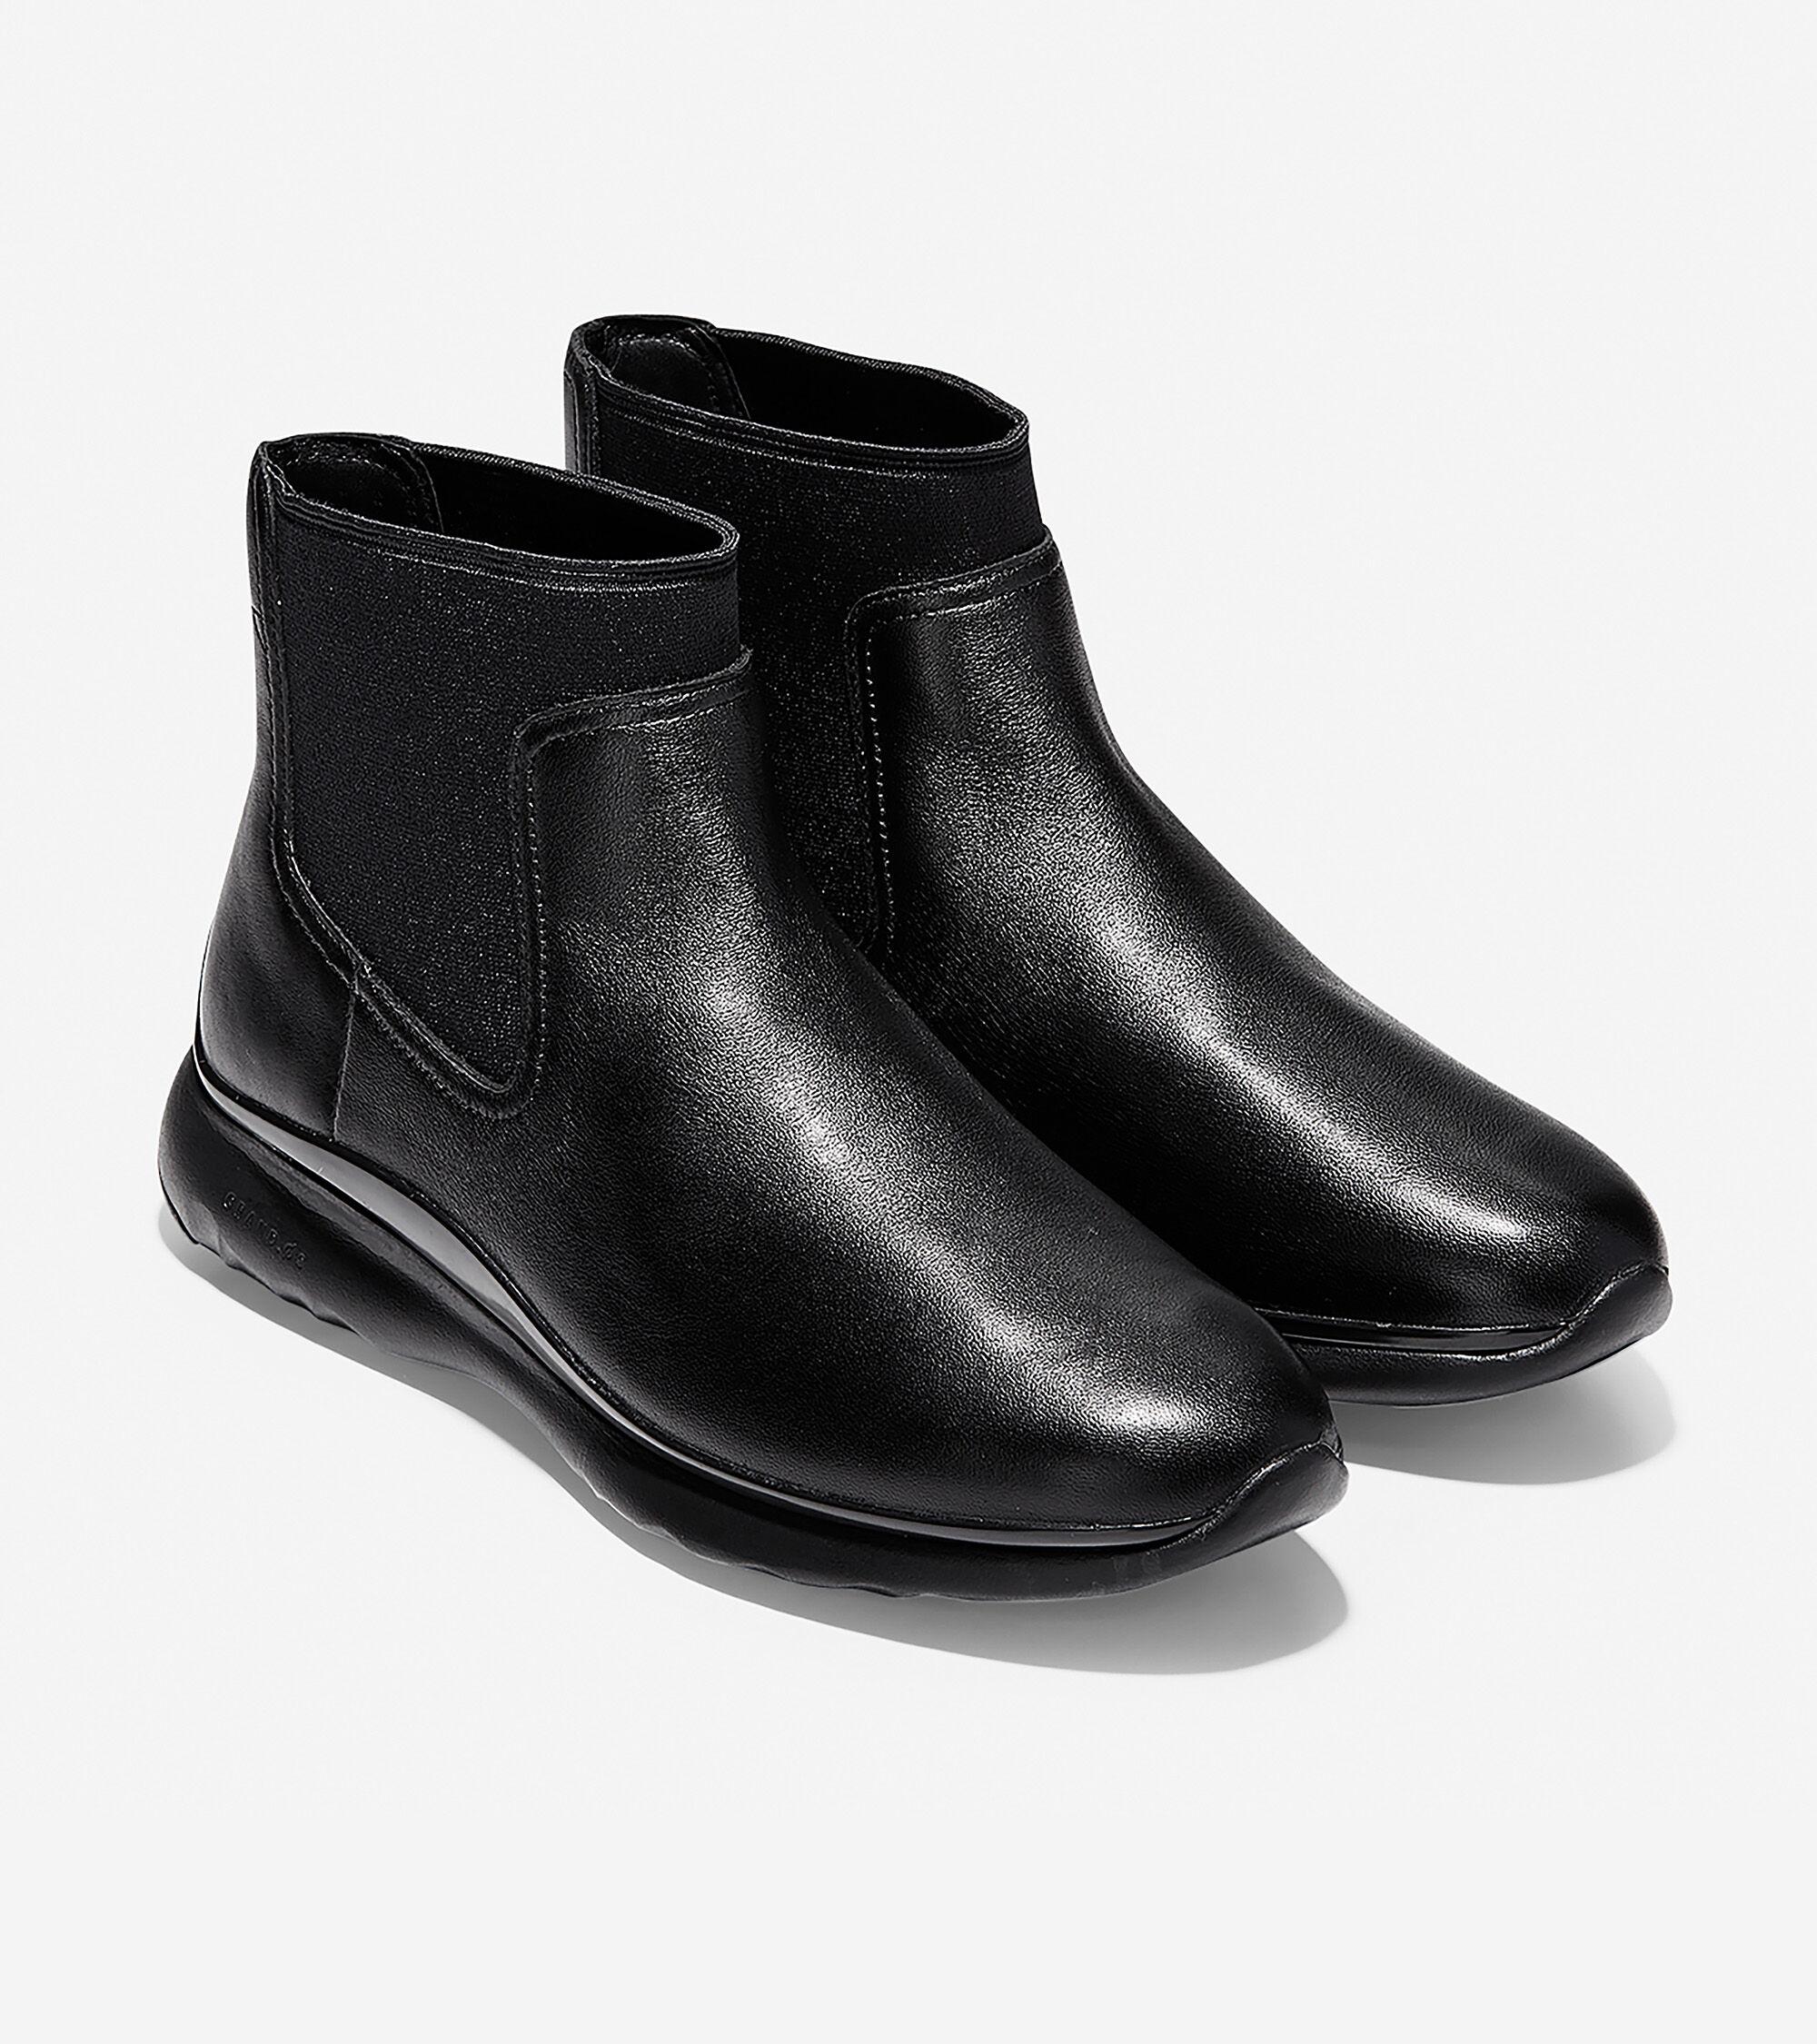 Chelsea Boots in Black   Cole Haan